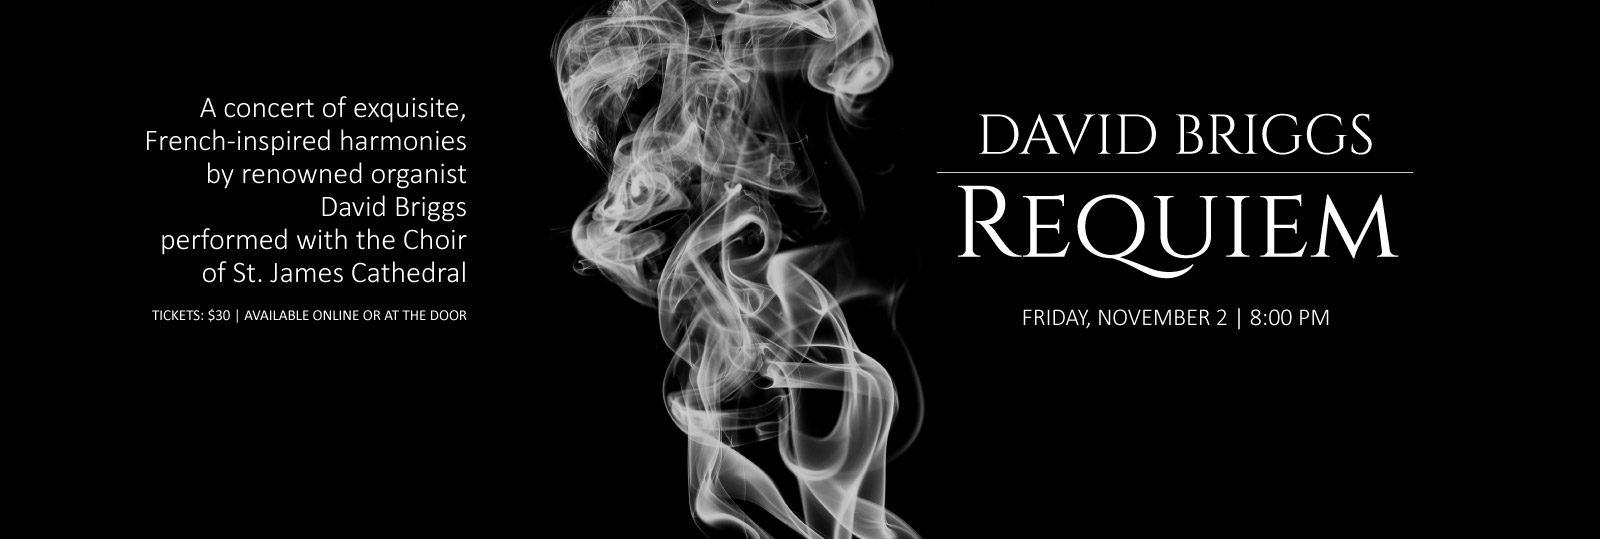 David Briggs Requiem